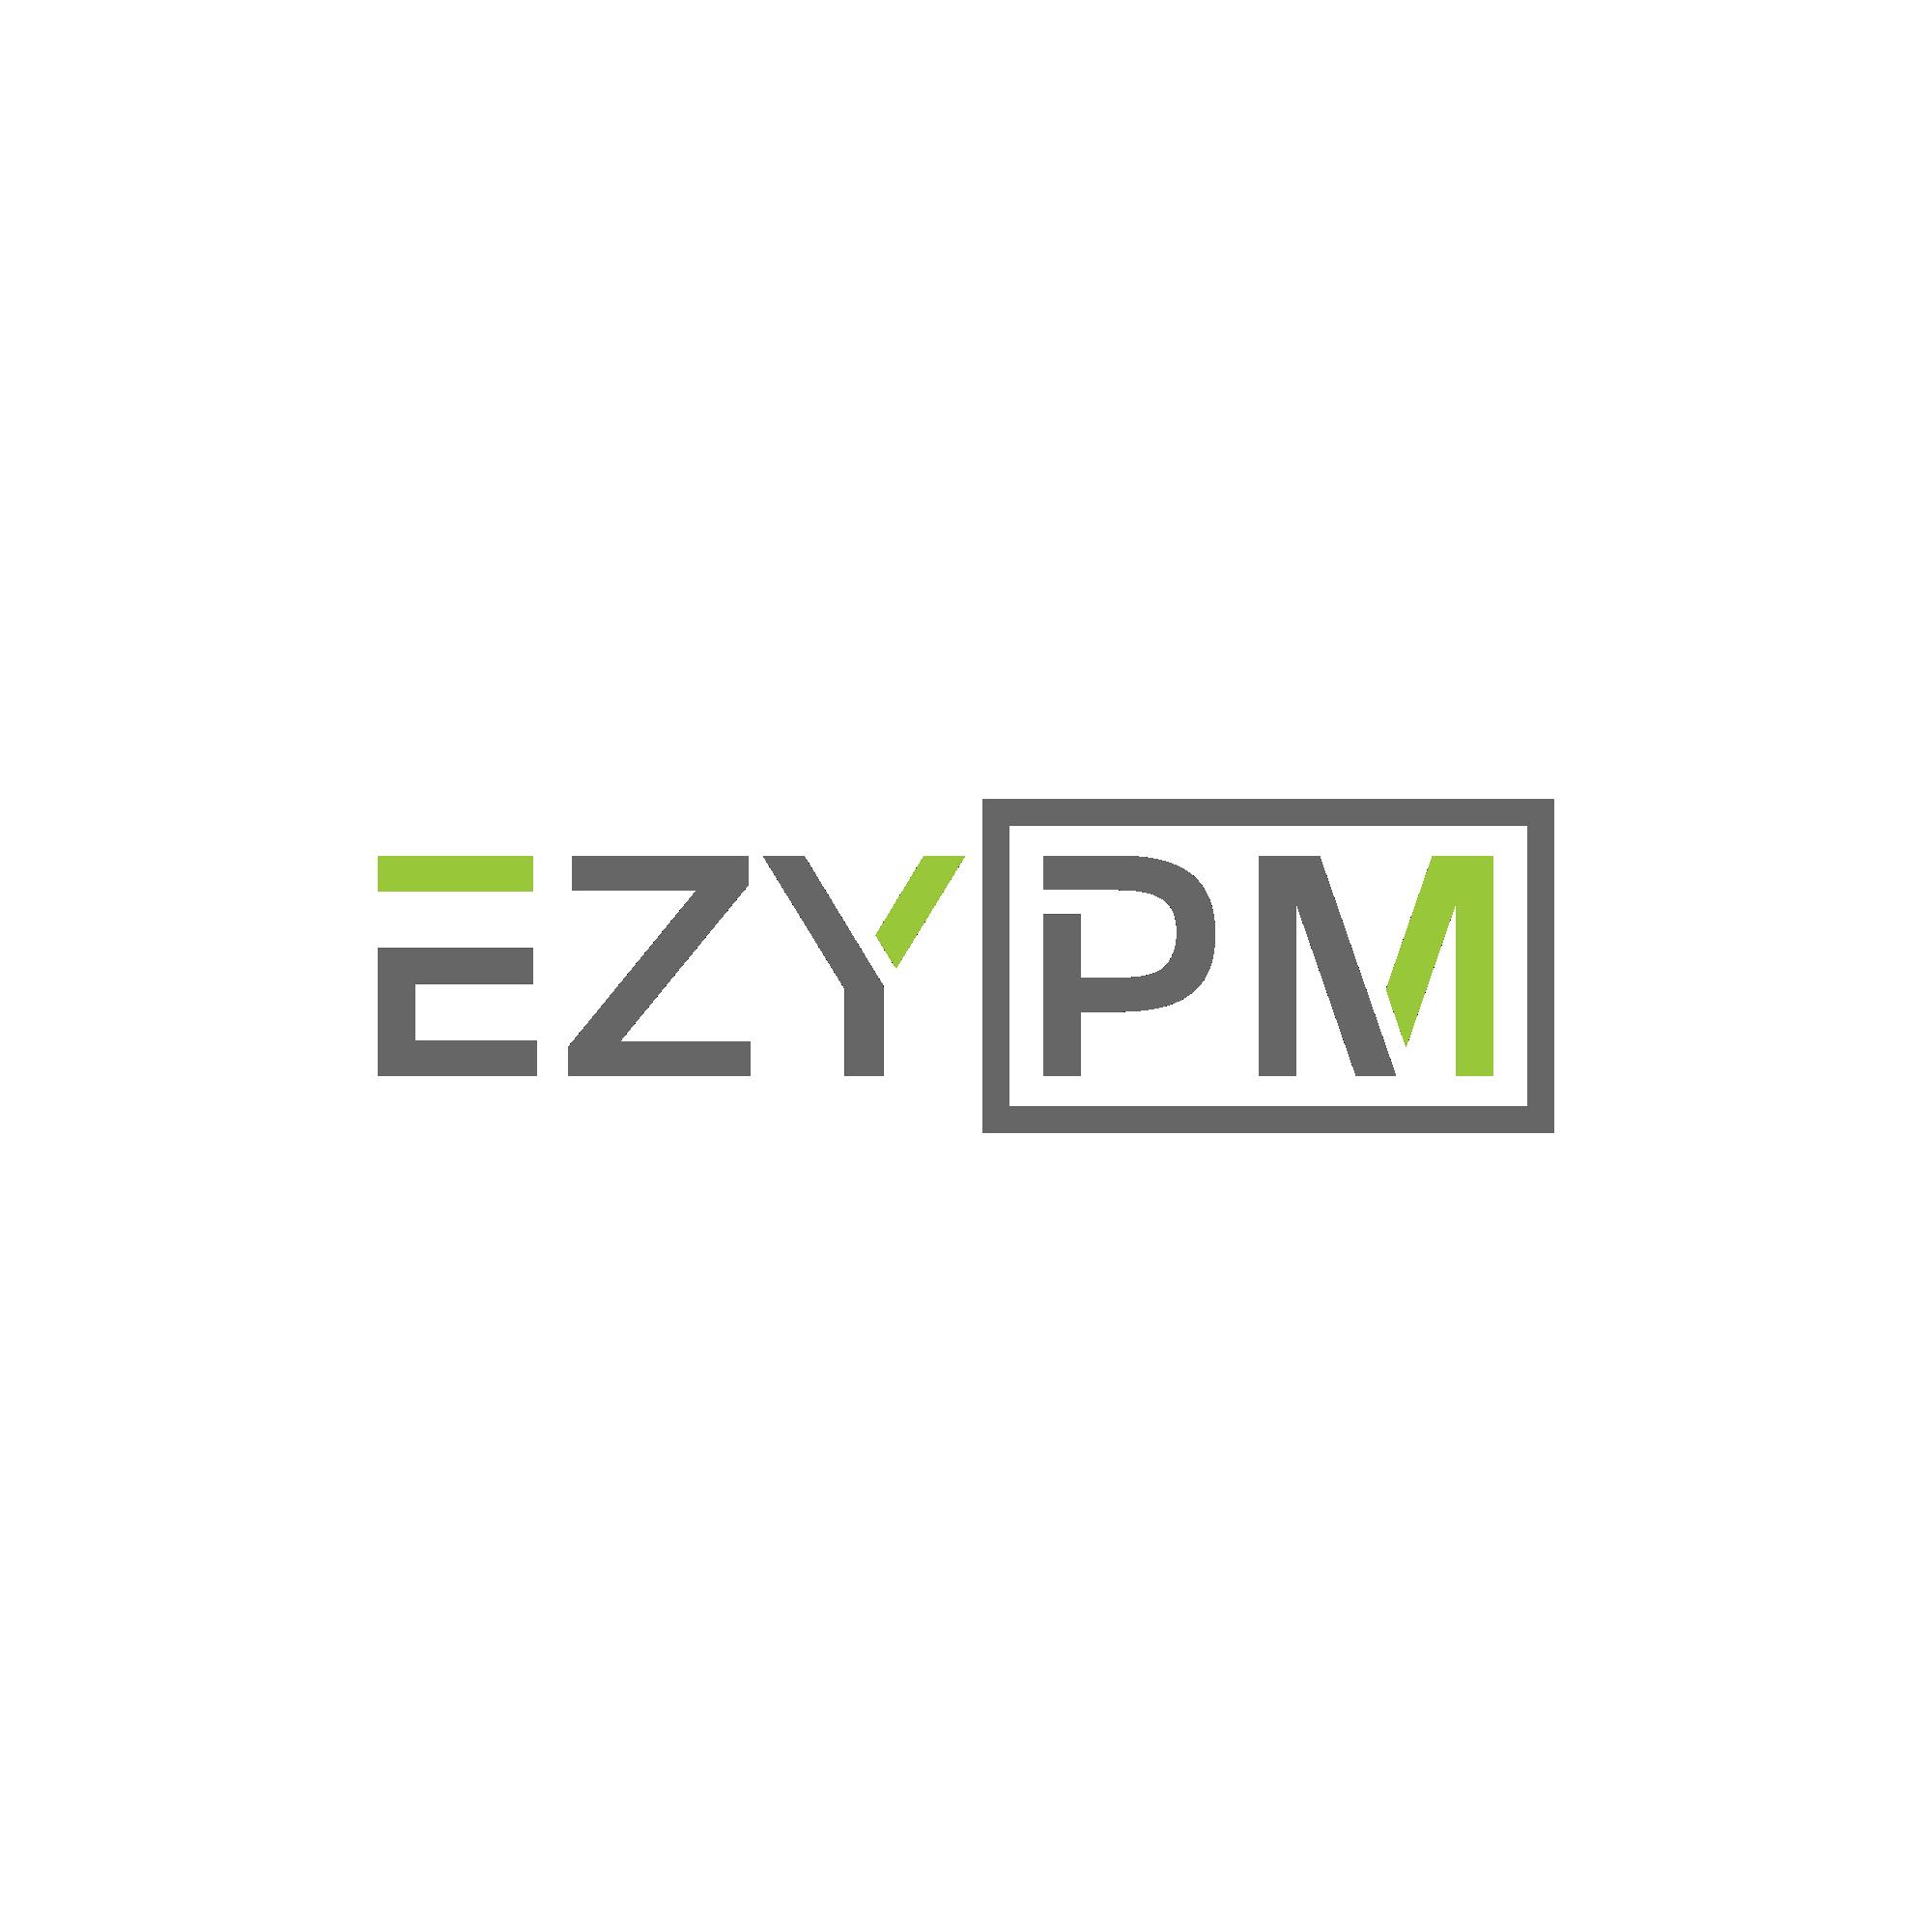 EZYPM WebApp